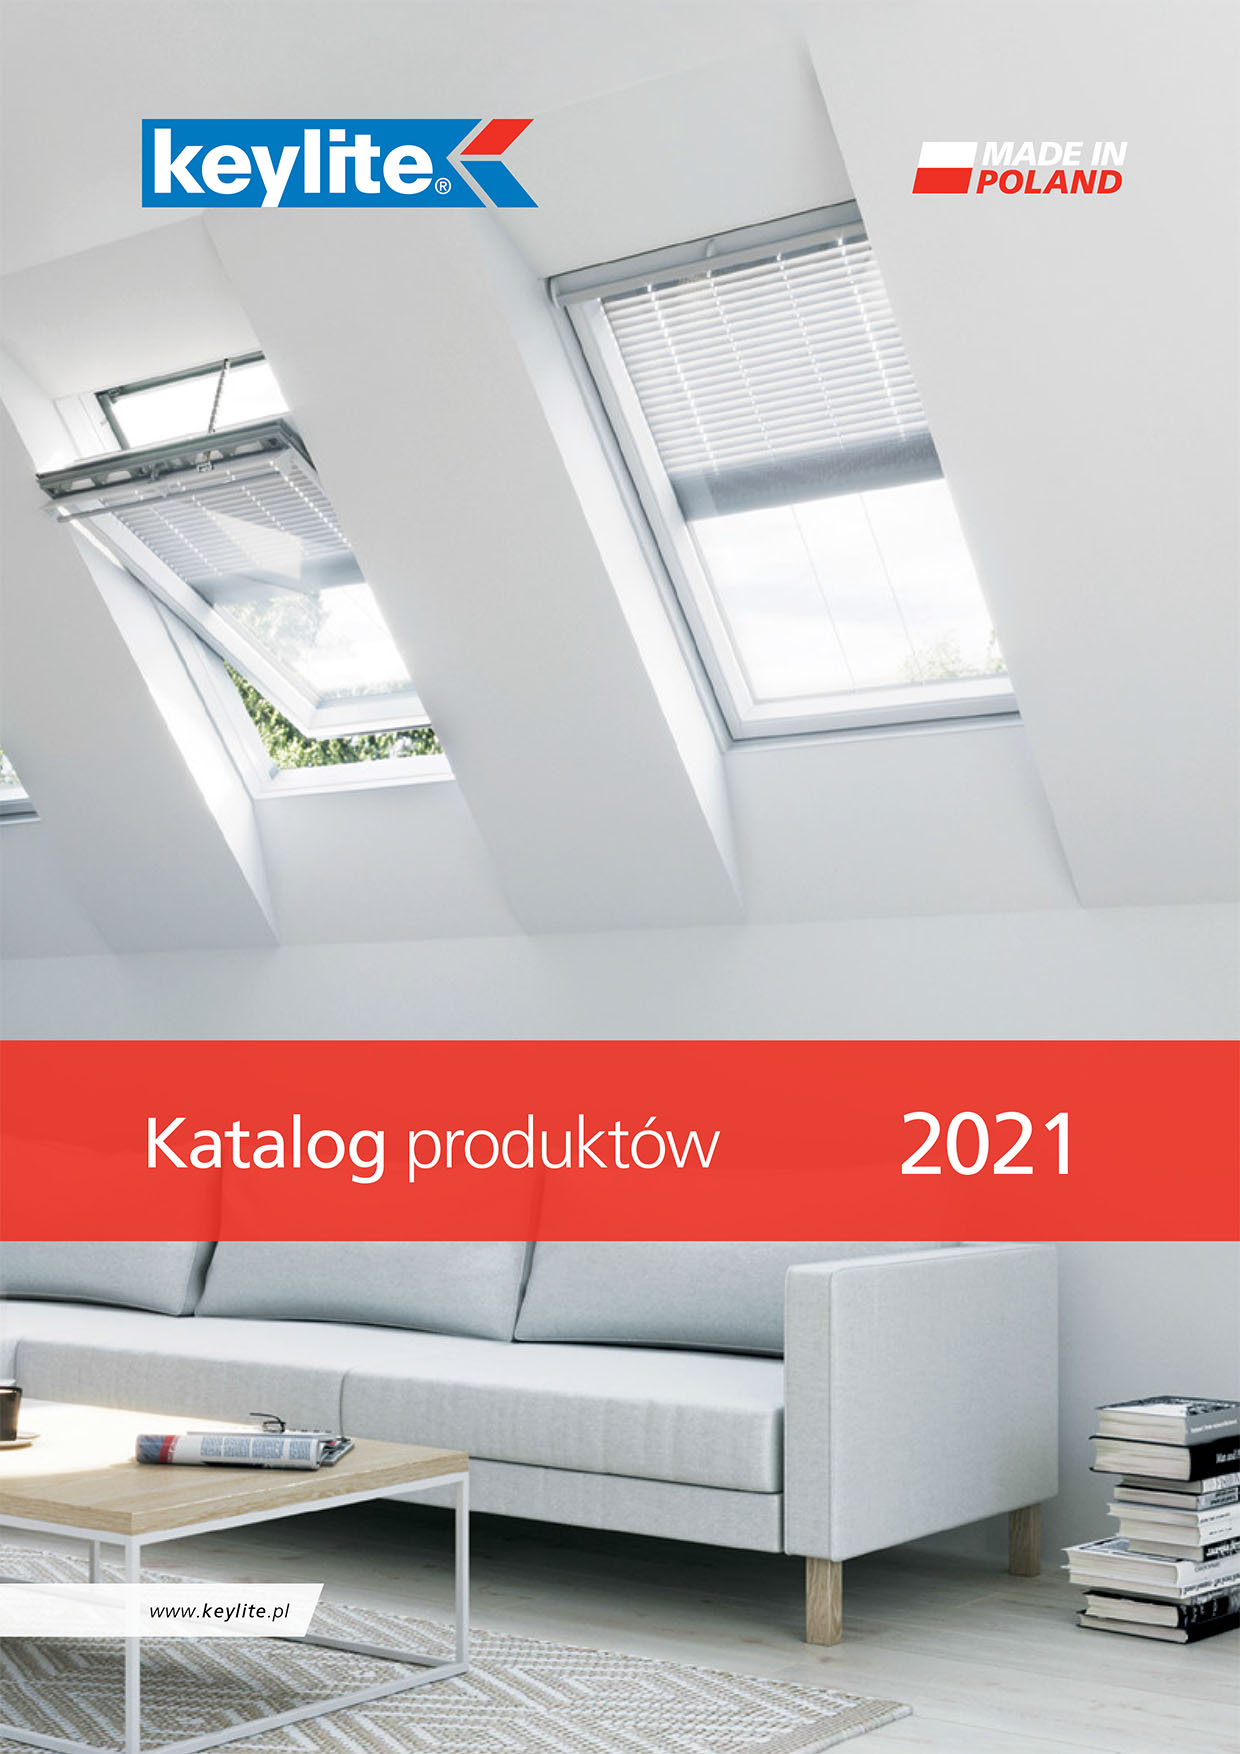 Katalog produktów 2021